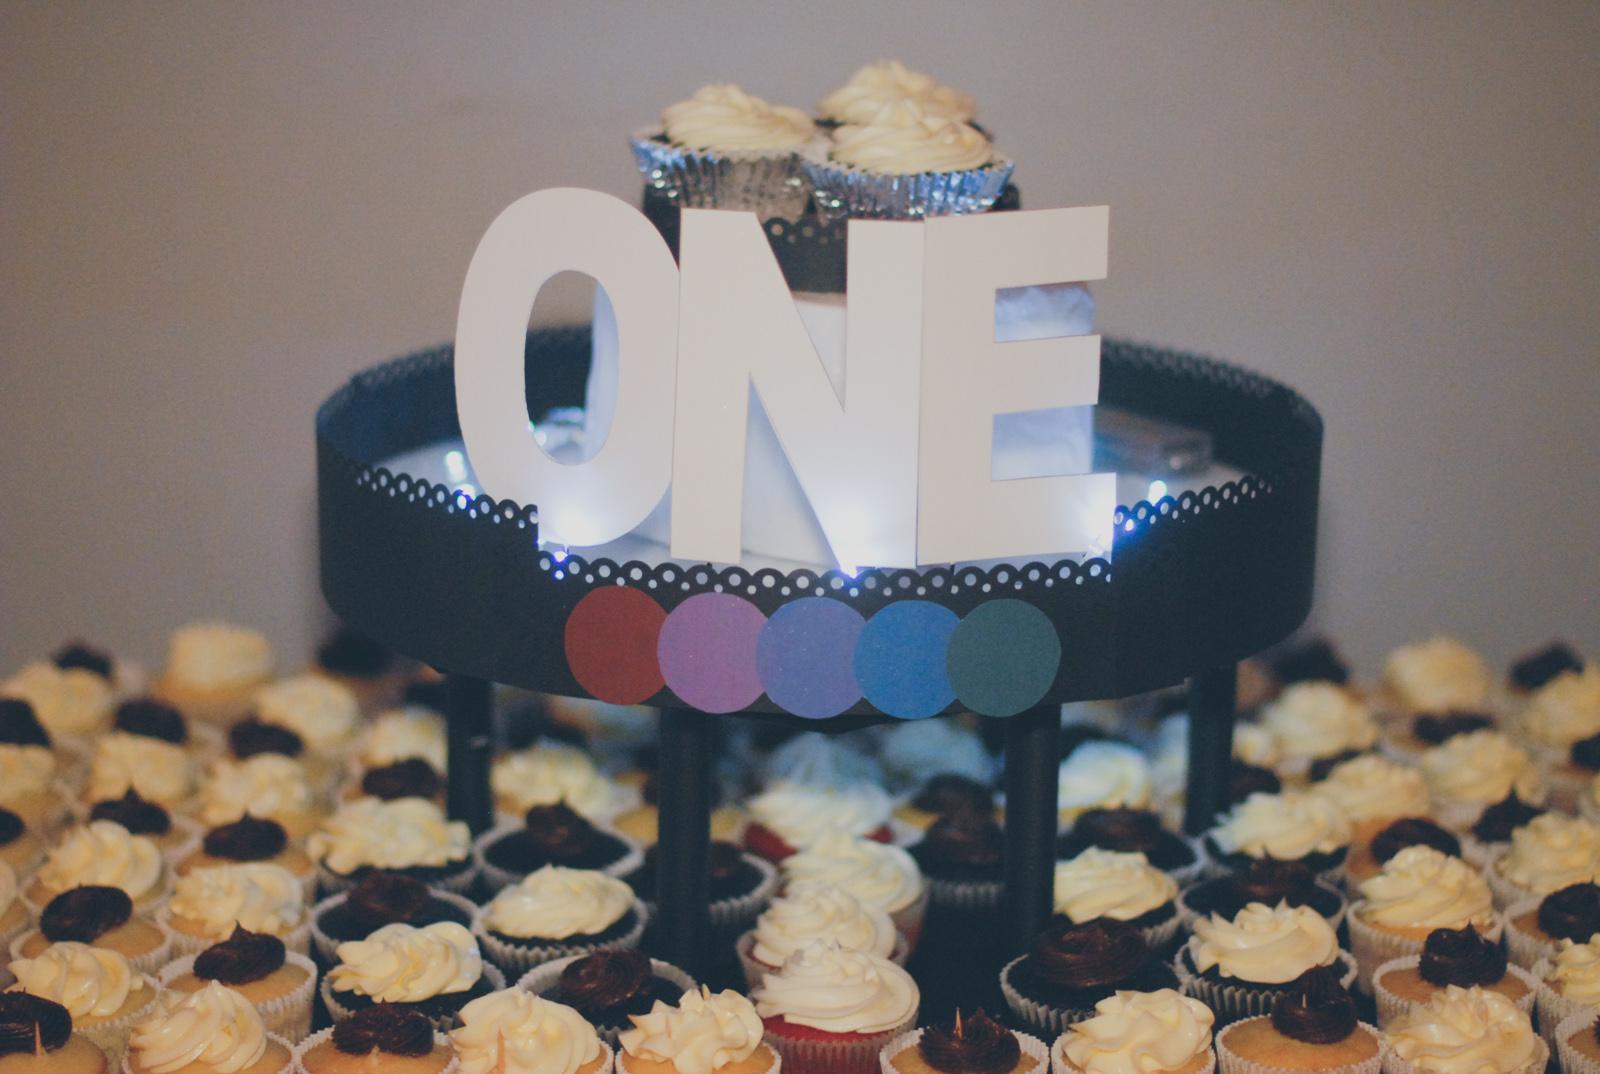 ONE_Celebration_01.jpg